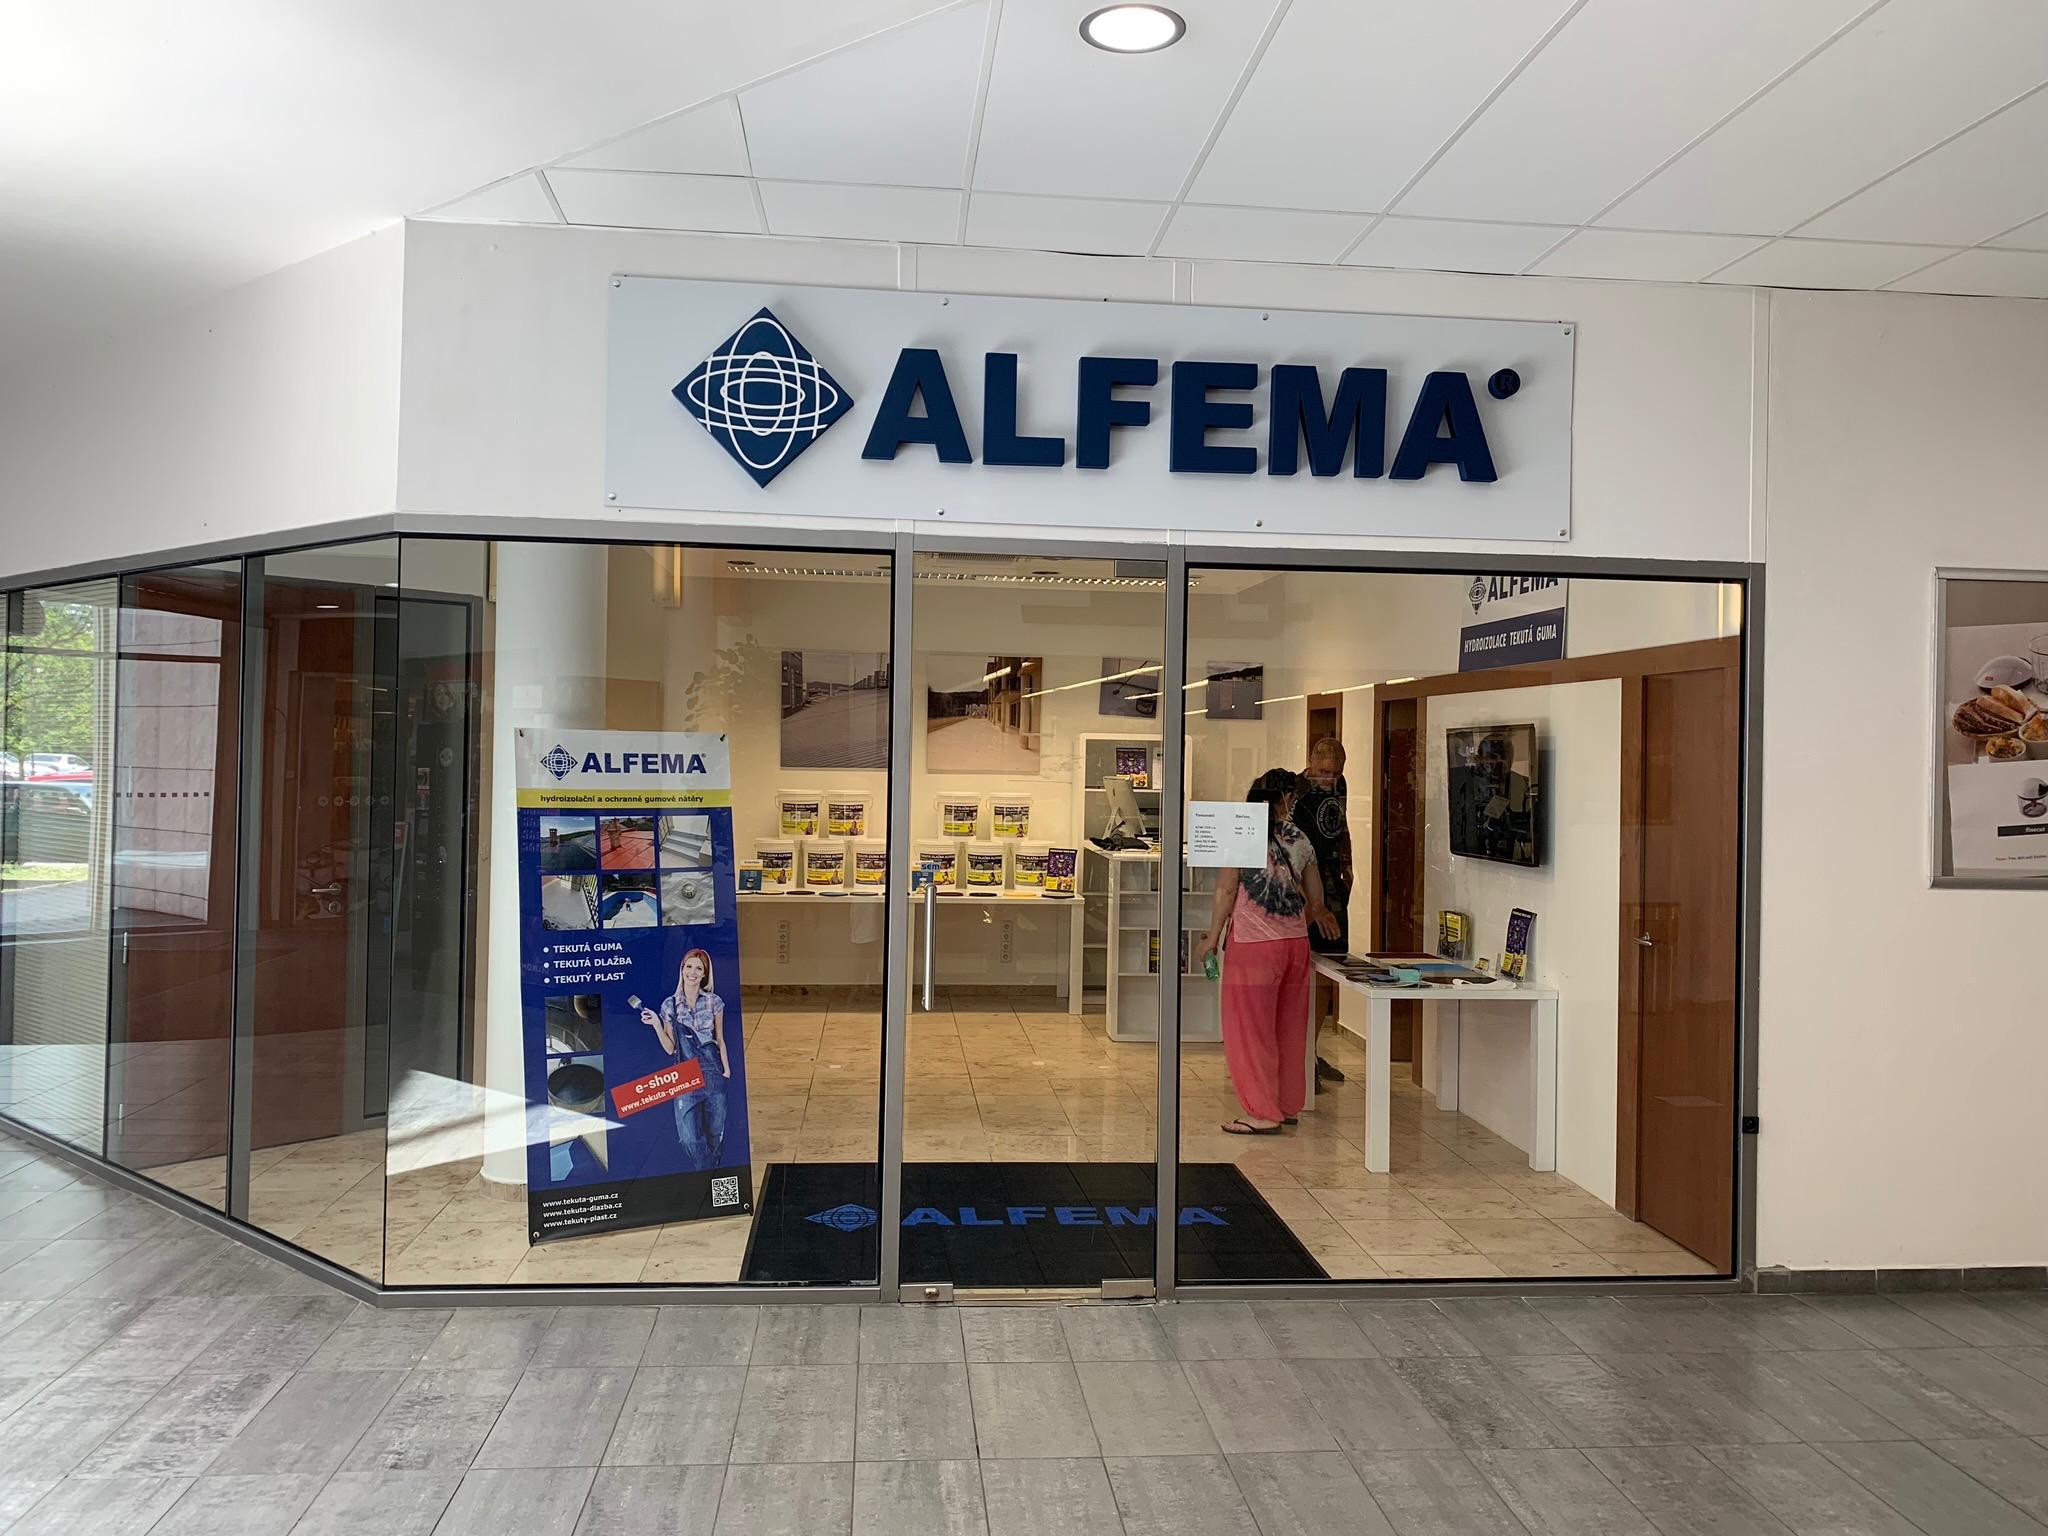 ALFEMA SHOWROOM CZ OTVORENÝ!